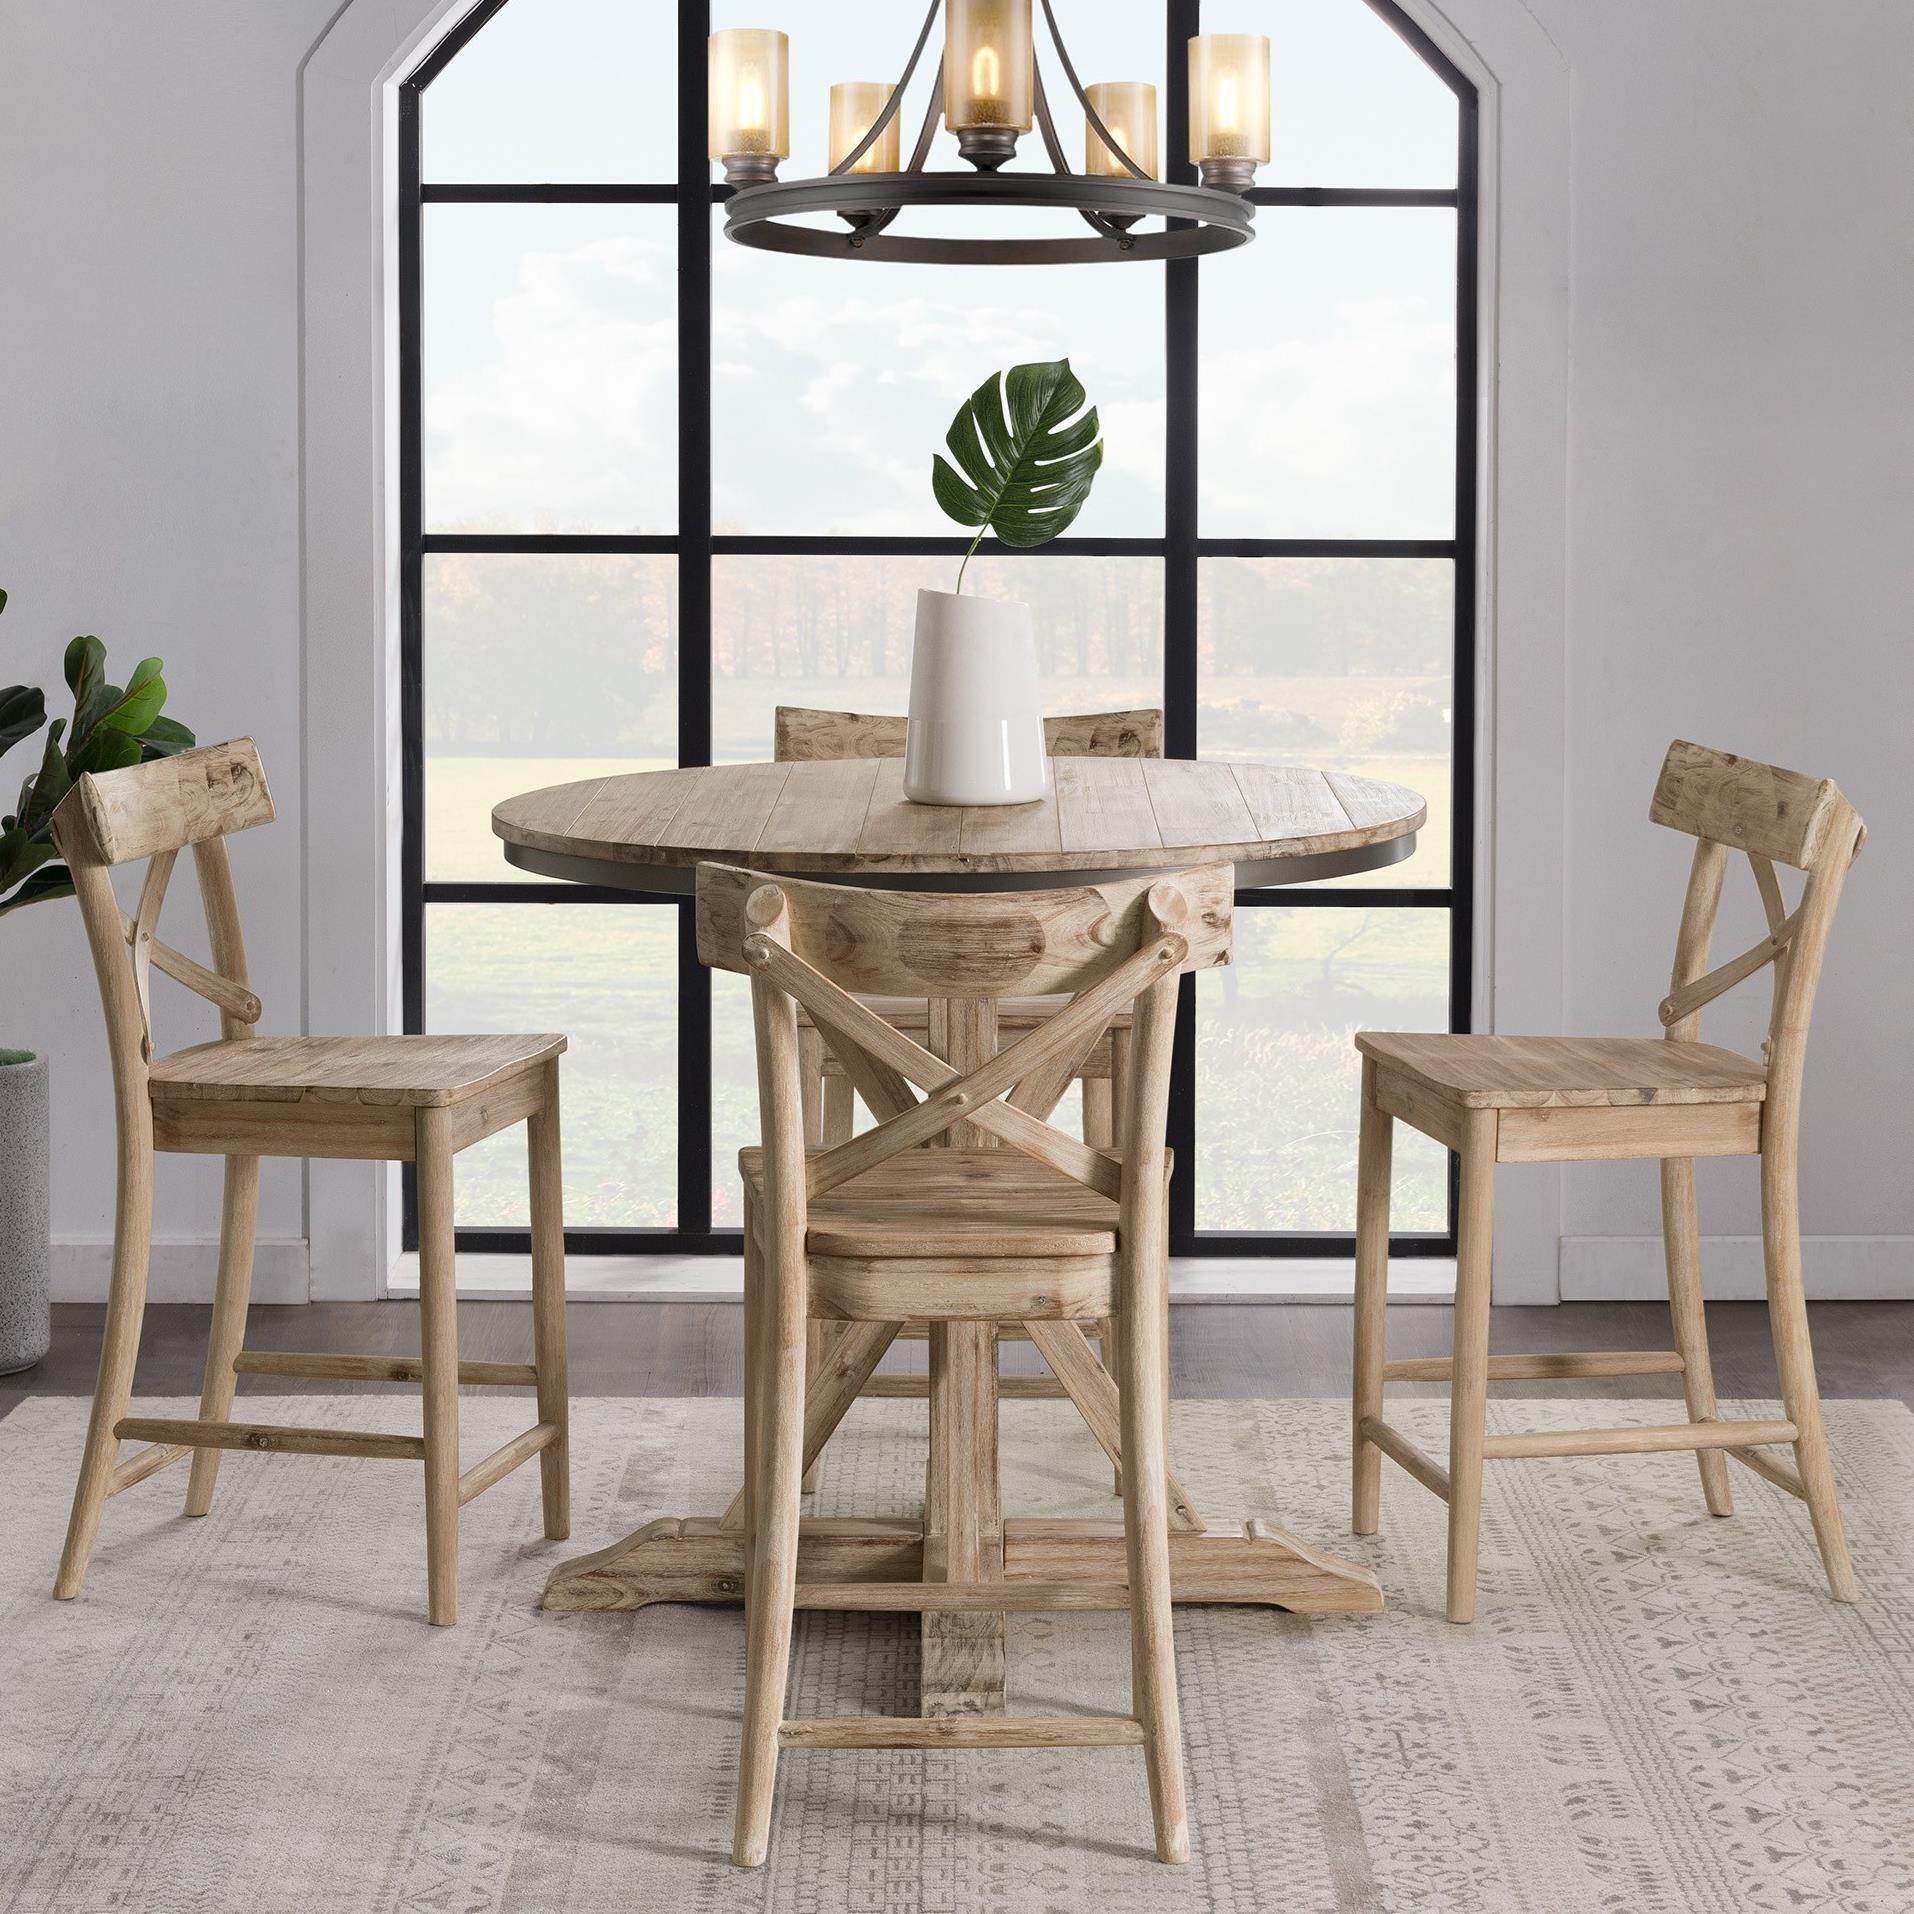 Callista Round Counter Height 5-Piece Dining Set by Elements International at Bullard Furniture